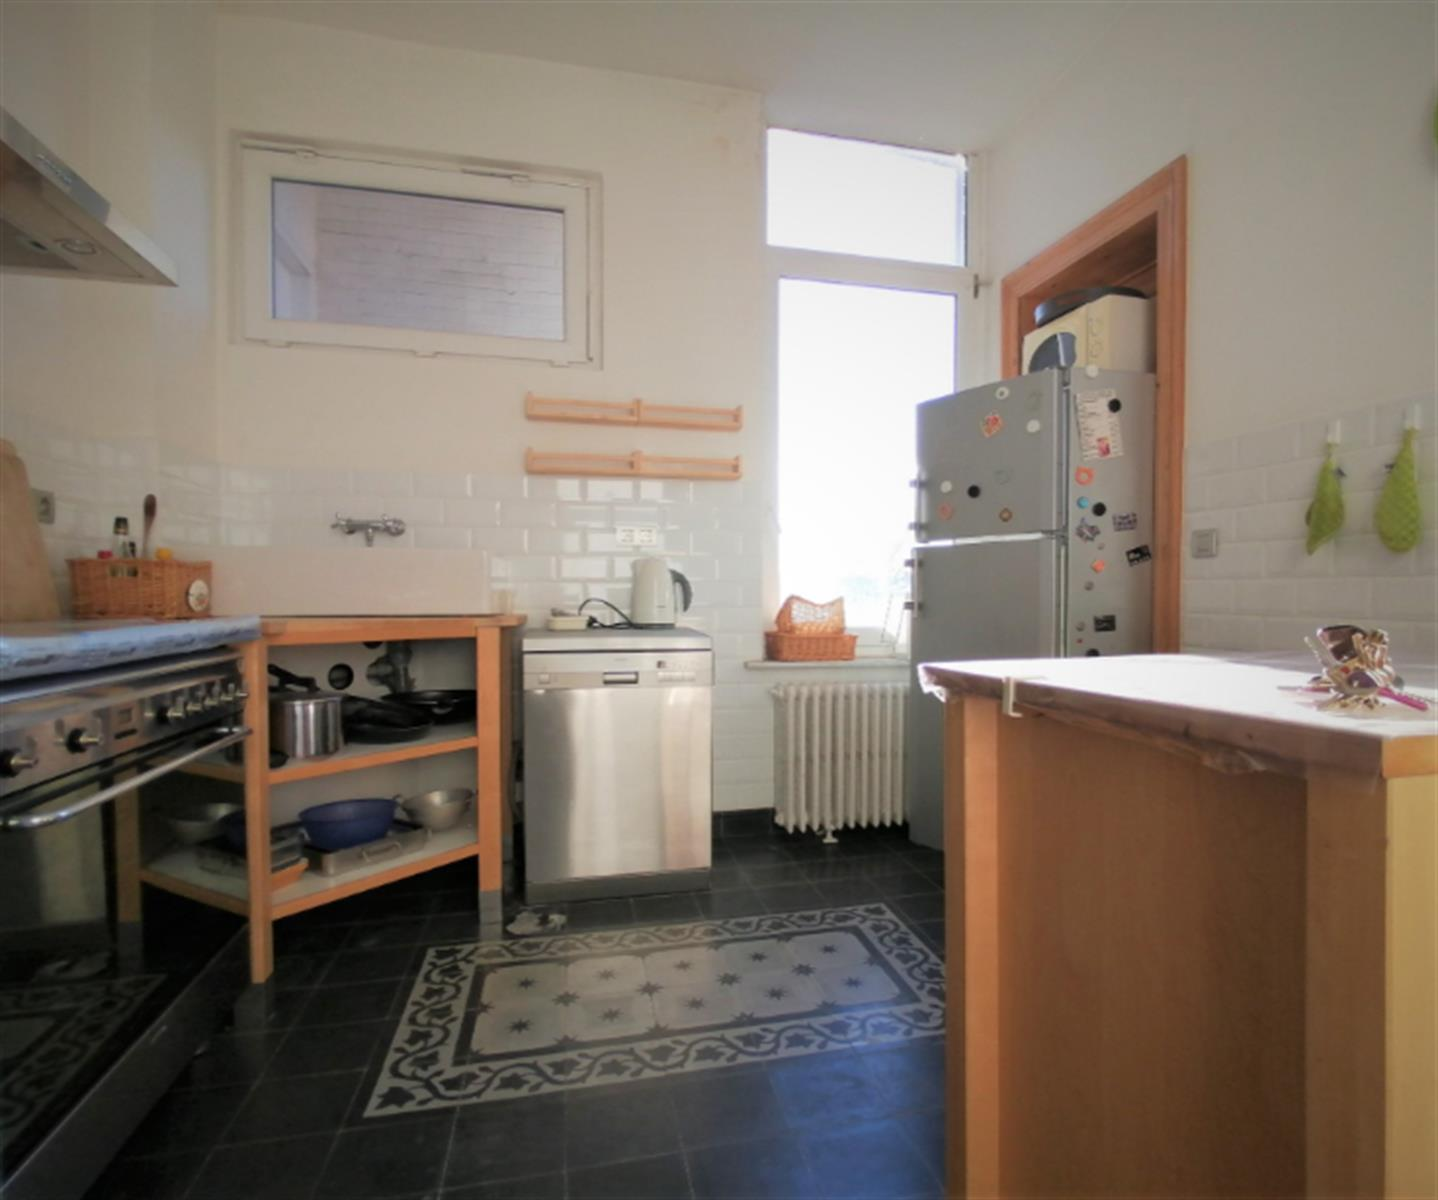 Appartement - Woluwe-Saint-Lambert - #4106440-3